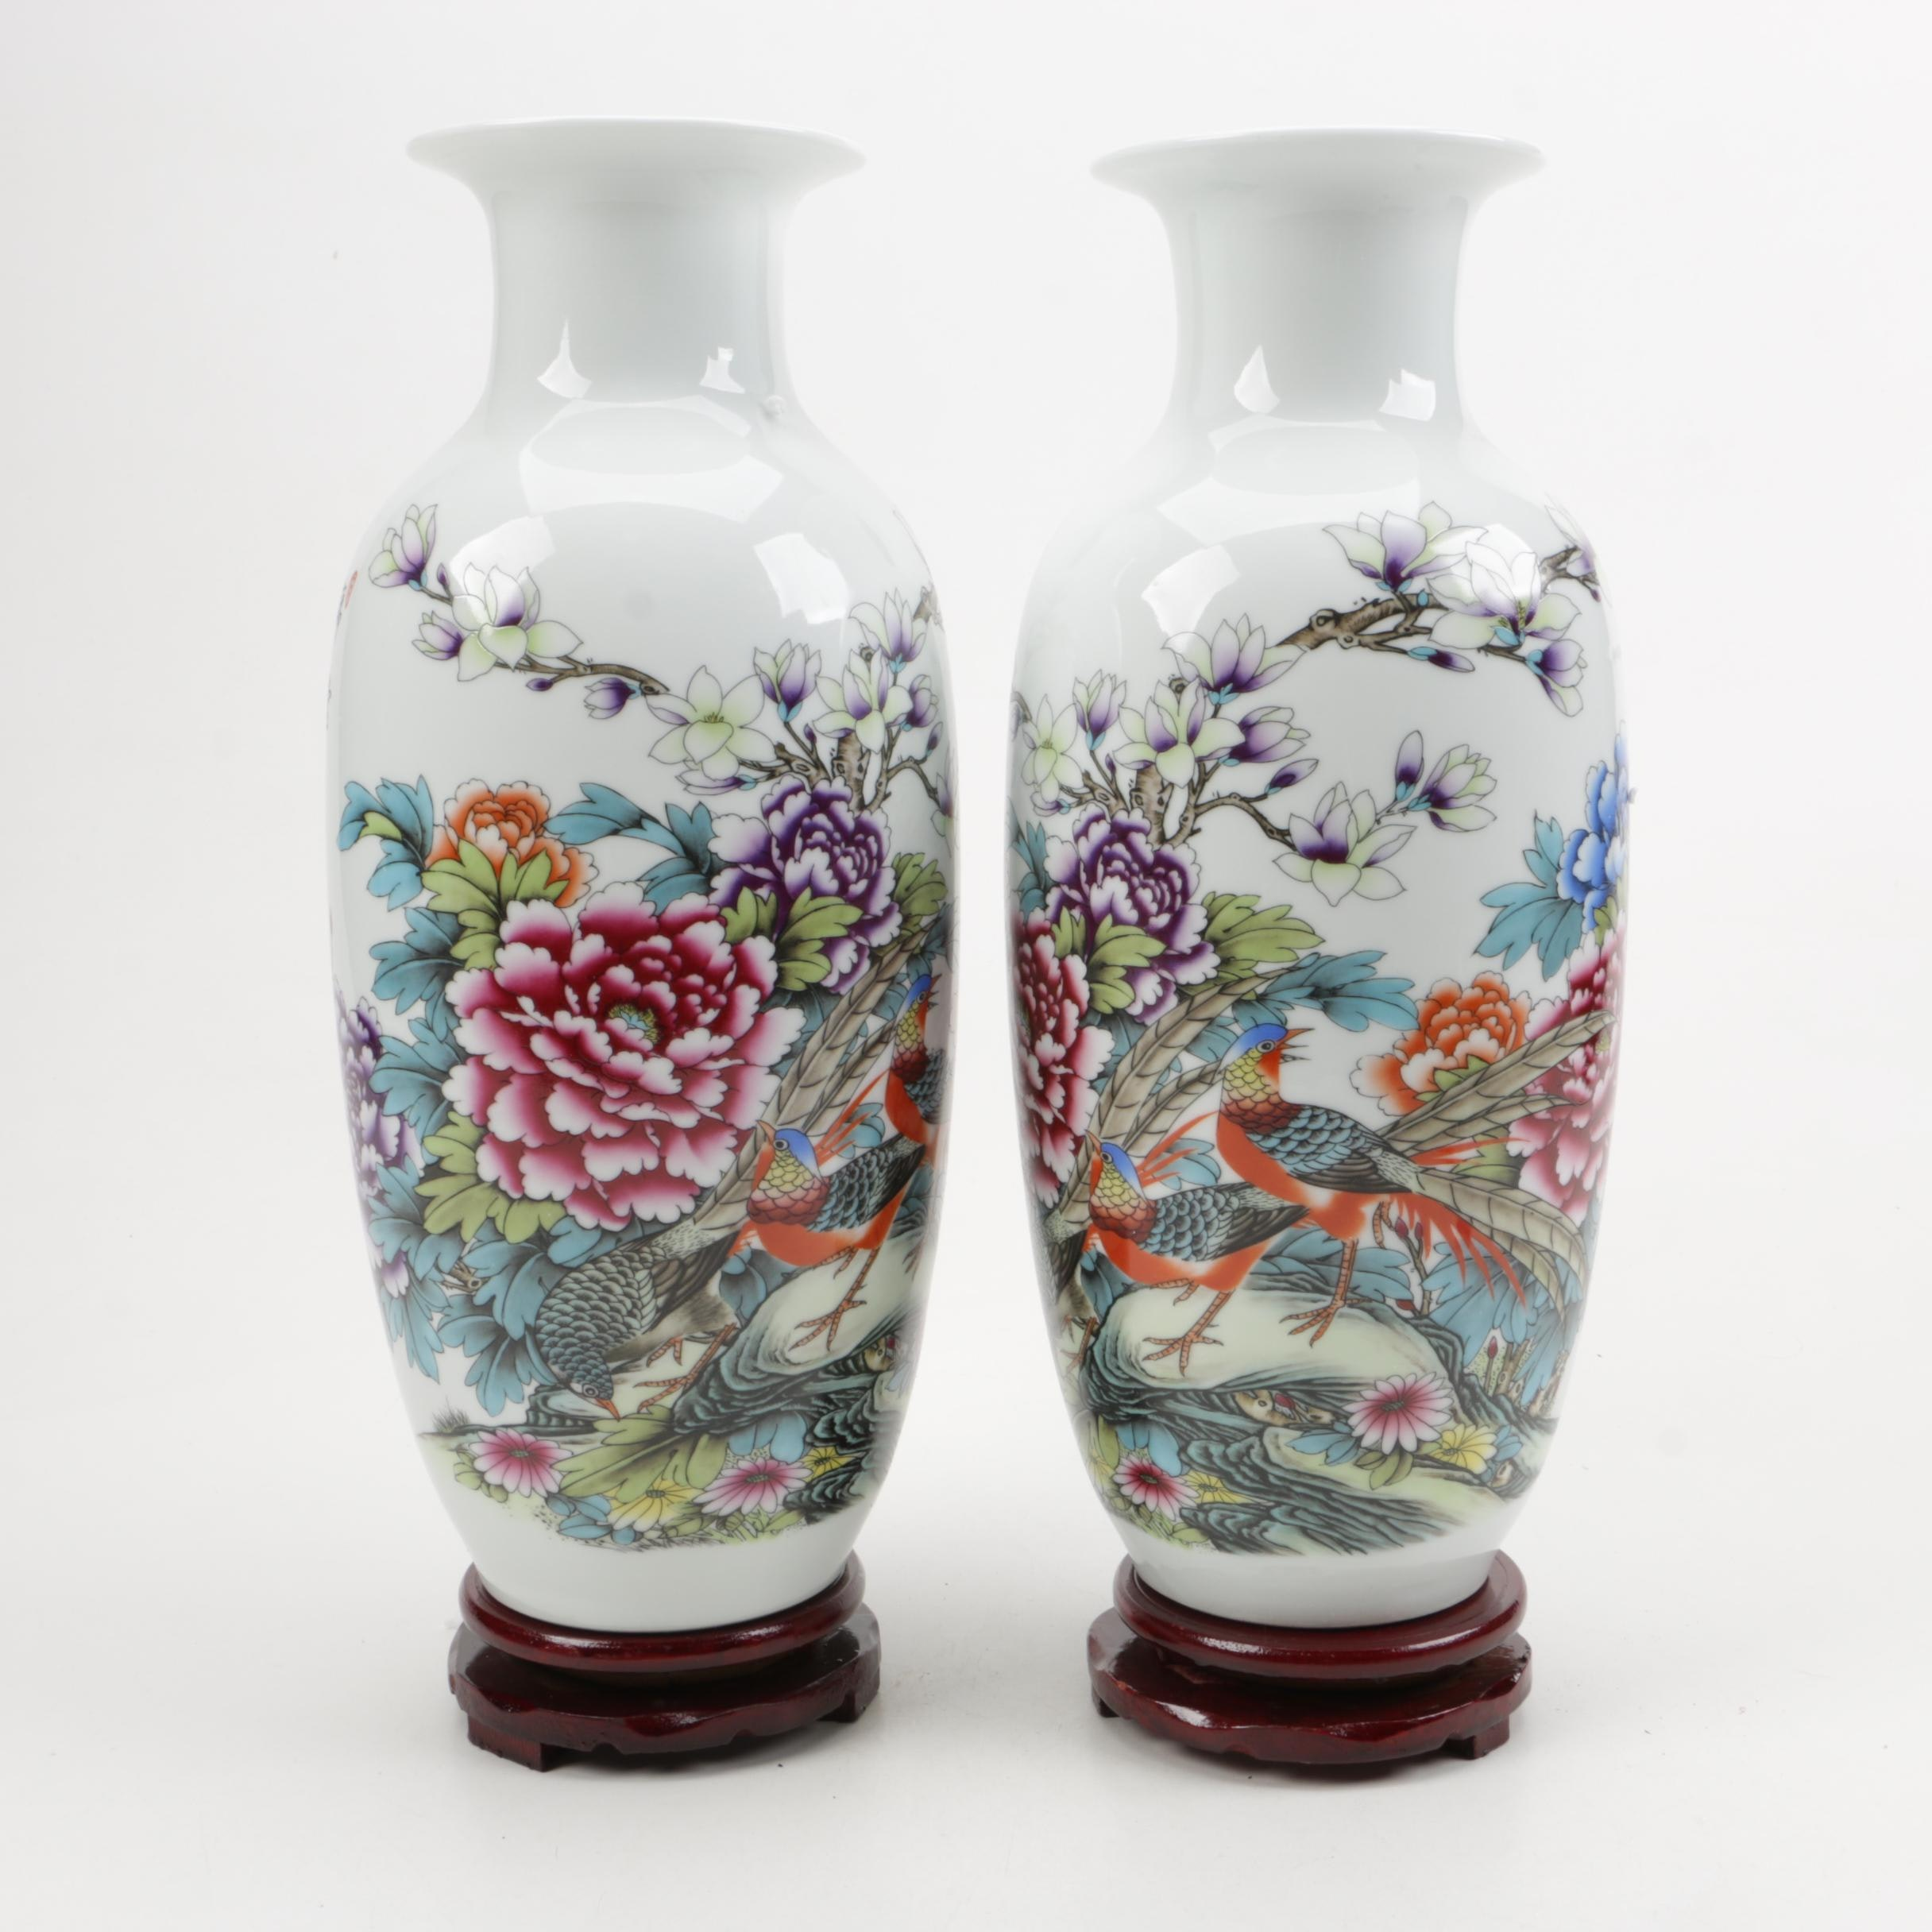 Pair of Porcelain Vases with Wood Plinth